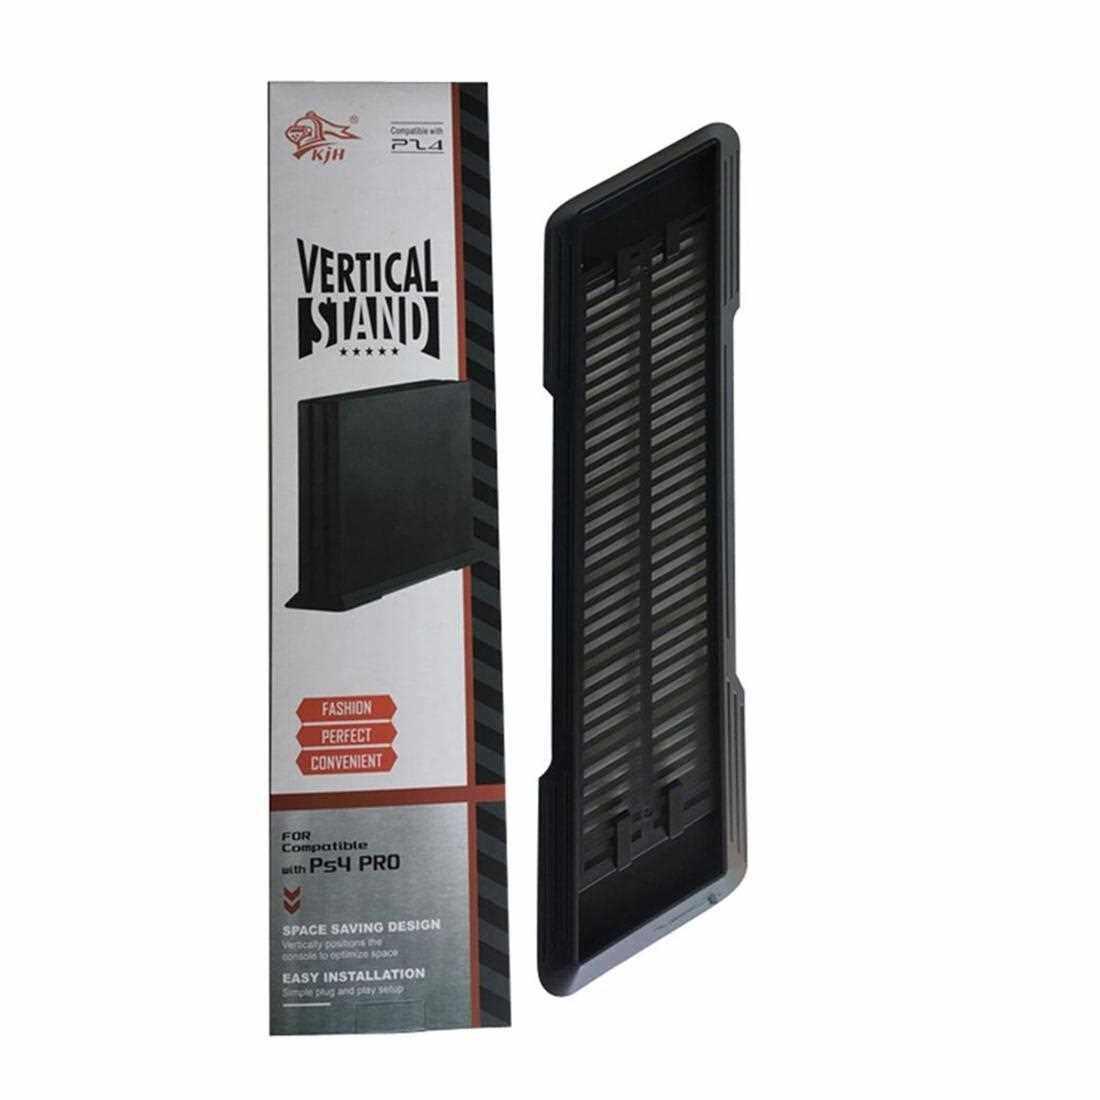 Simple Design Console Vertical Stand Mount Holder Dock Mount Cradle For PS4 (Black)